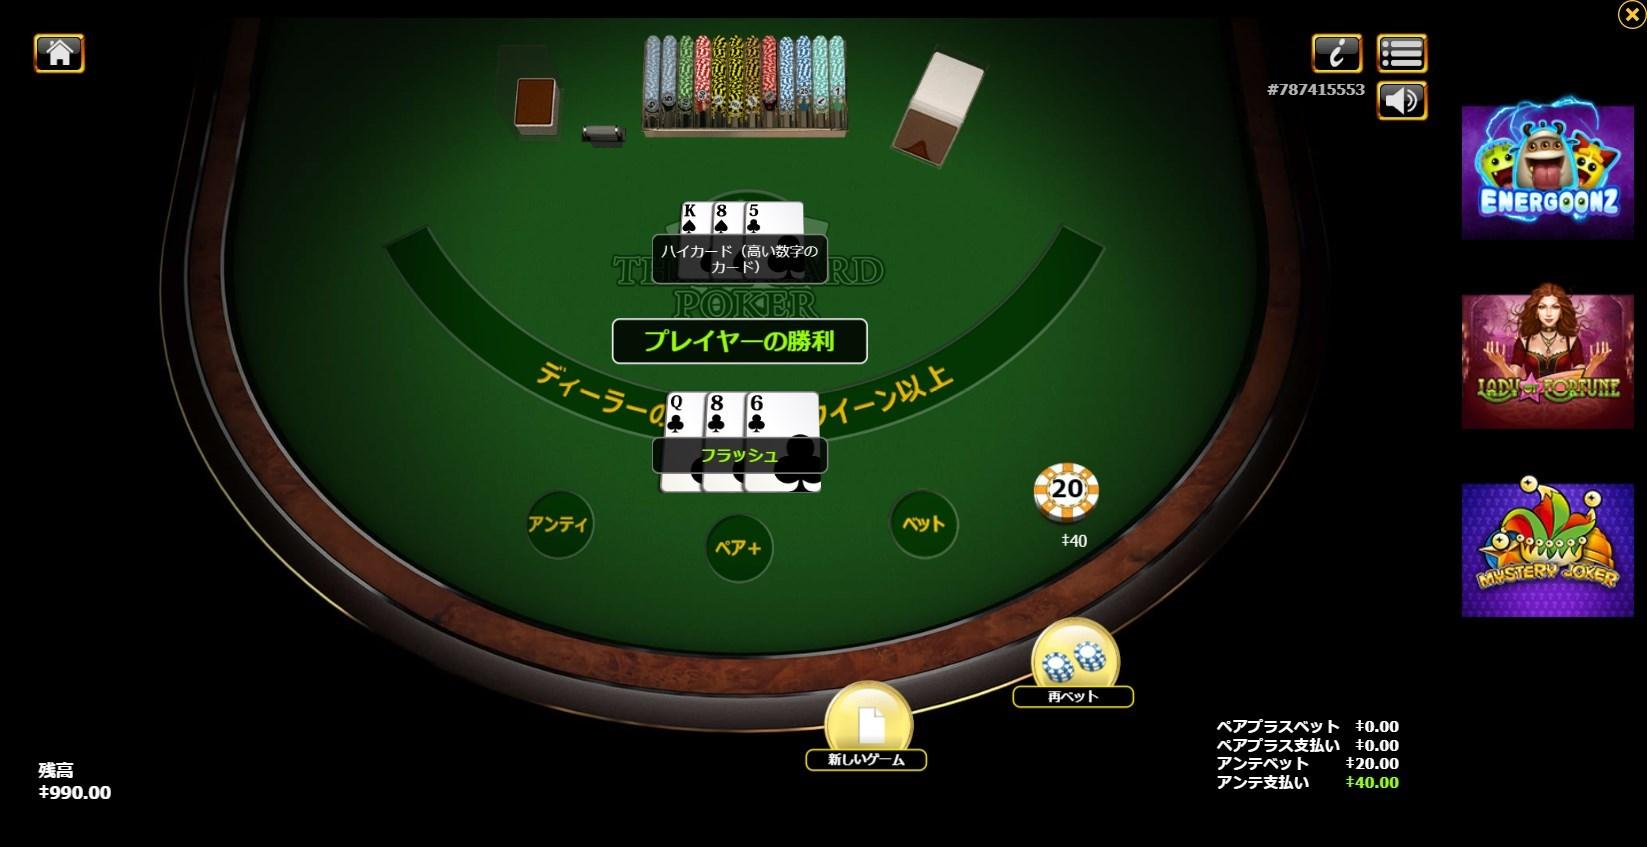 3 Card Poker(スリーカードポーカー/富貴三公)